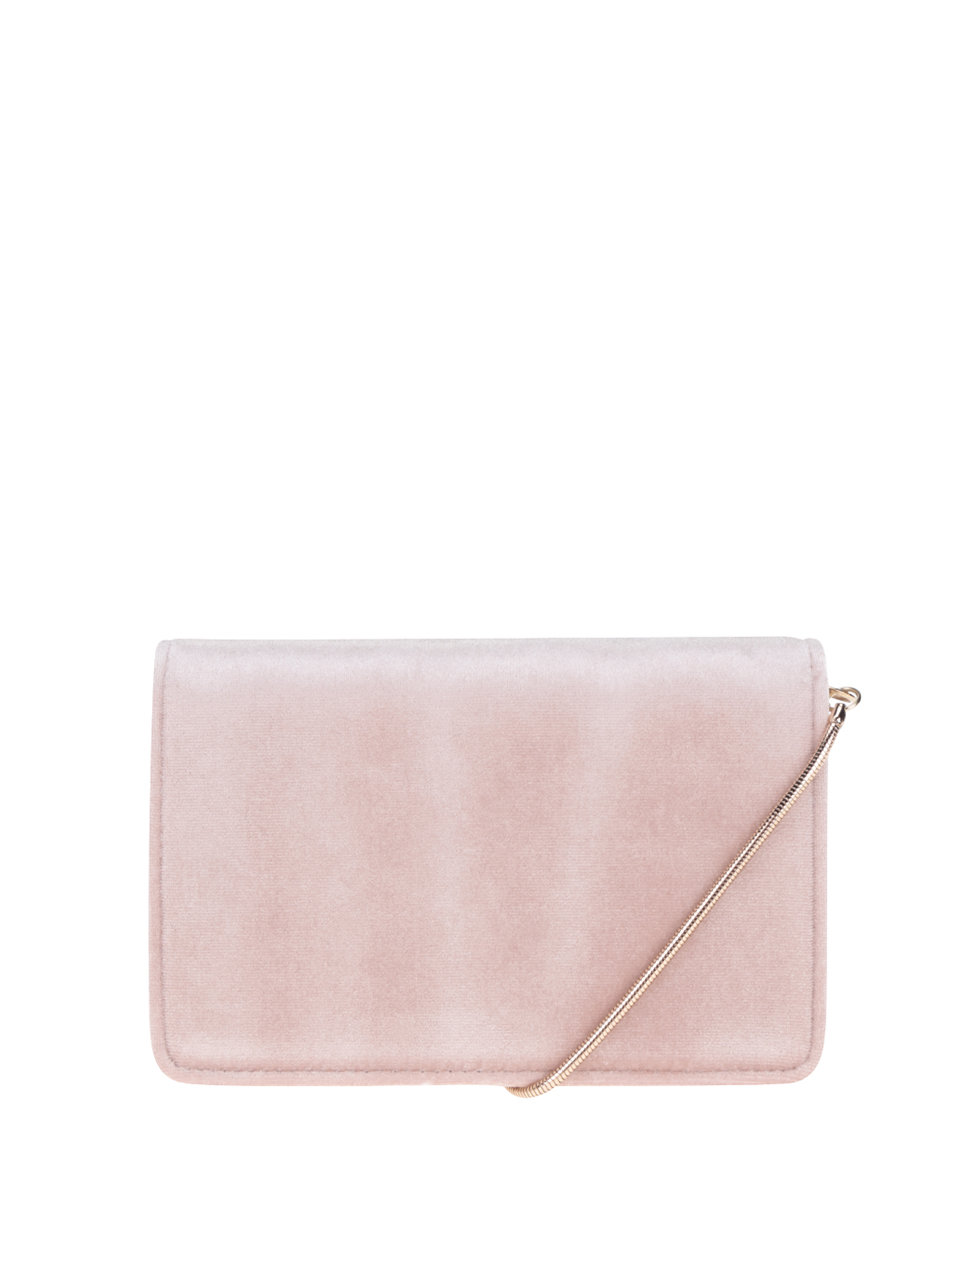 6d867153eb Ružová listová kabelka Miss Selfridge ...